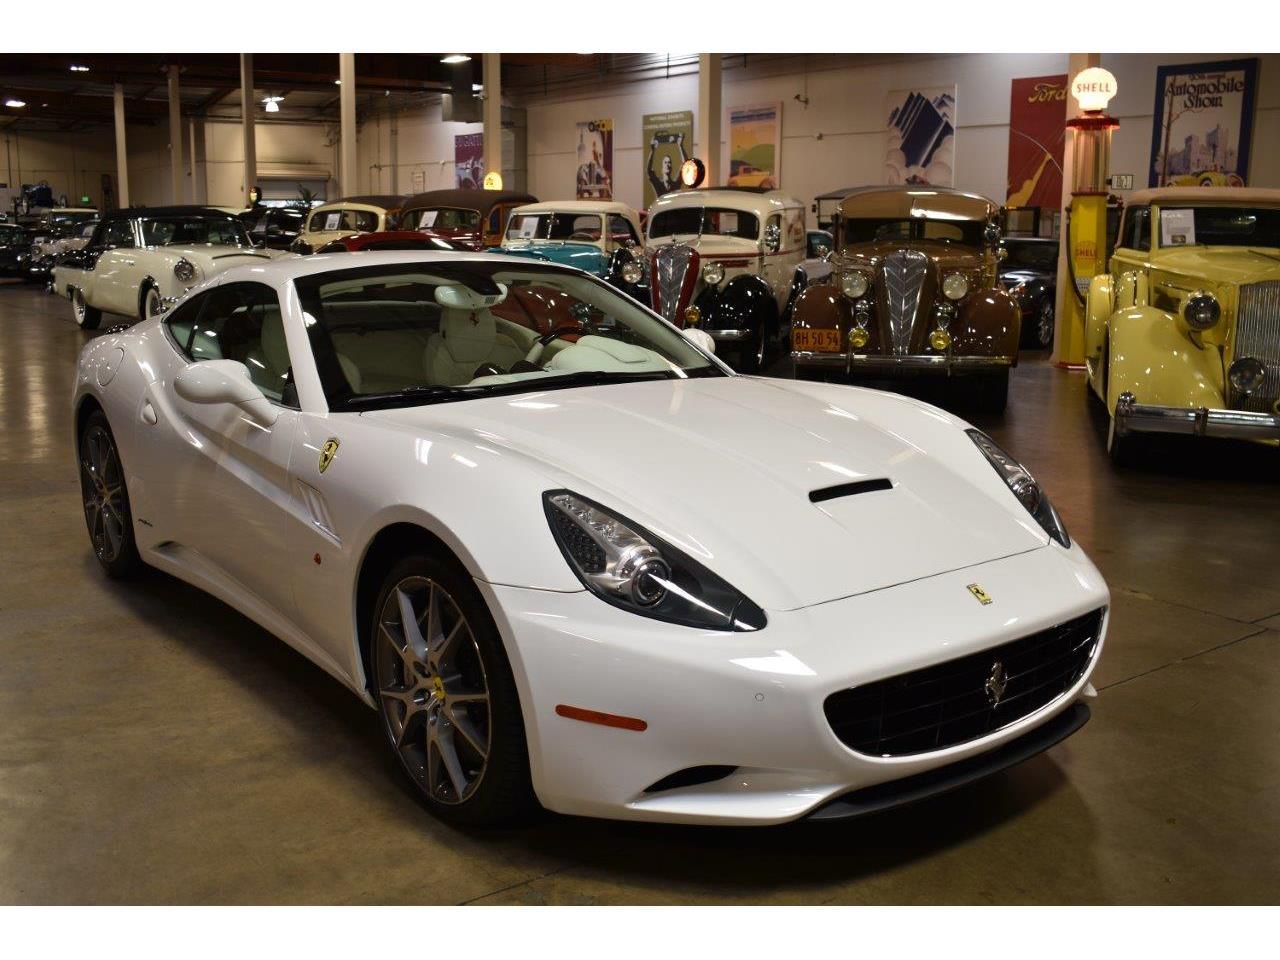 Large Picture of '10 Ferrari California located in Costa Mesa California - $159,000.00 - QD41